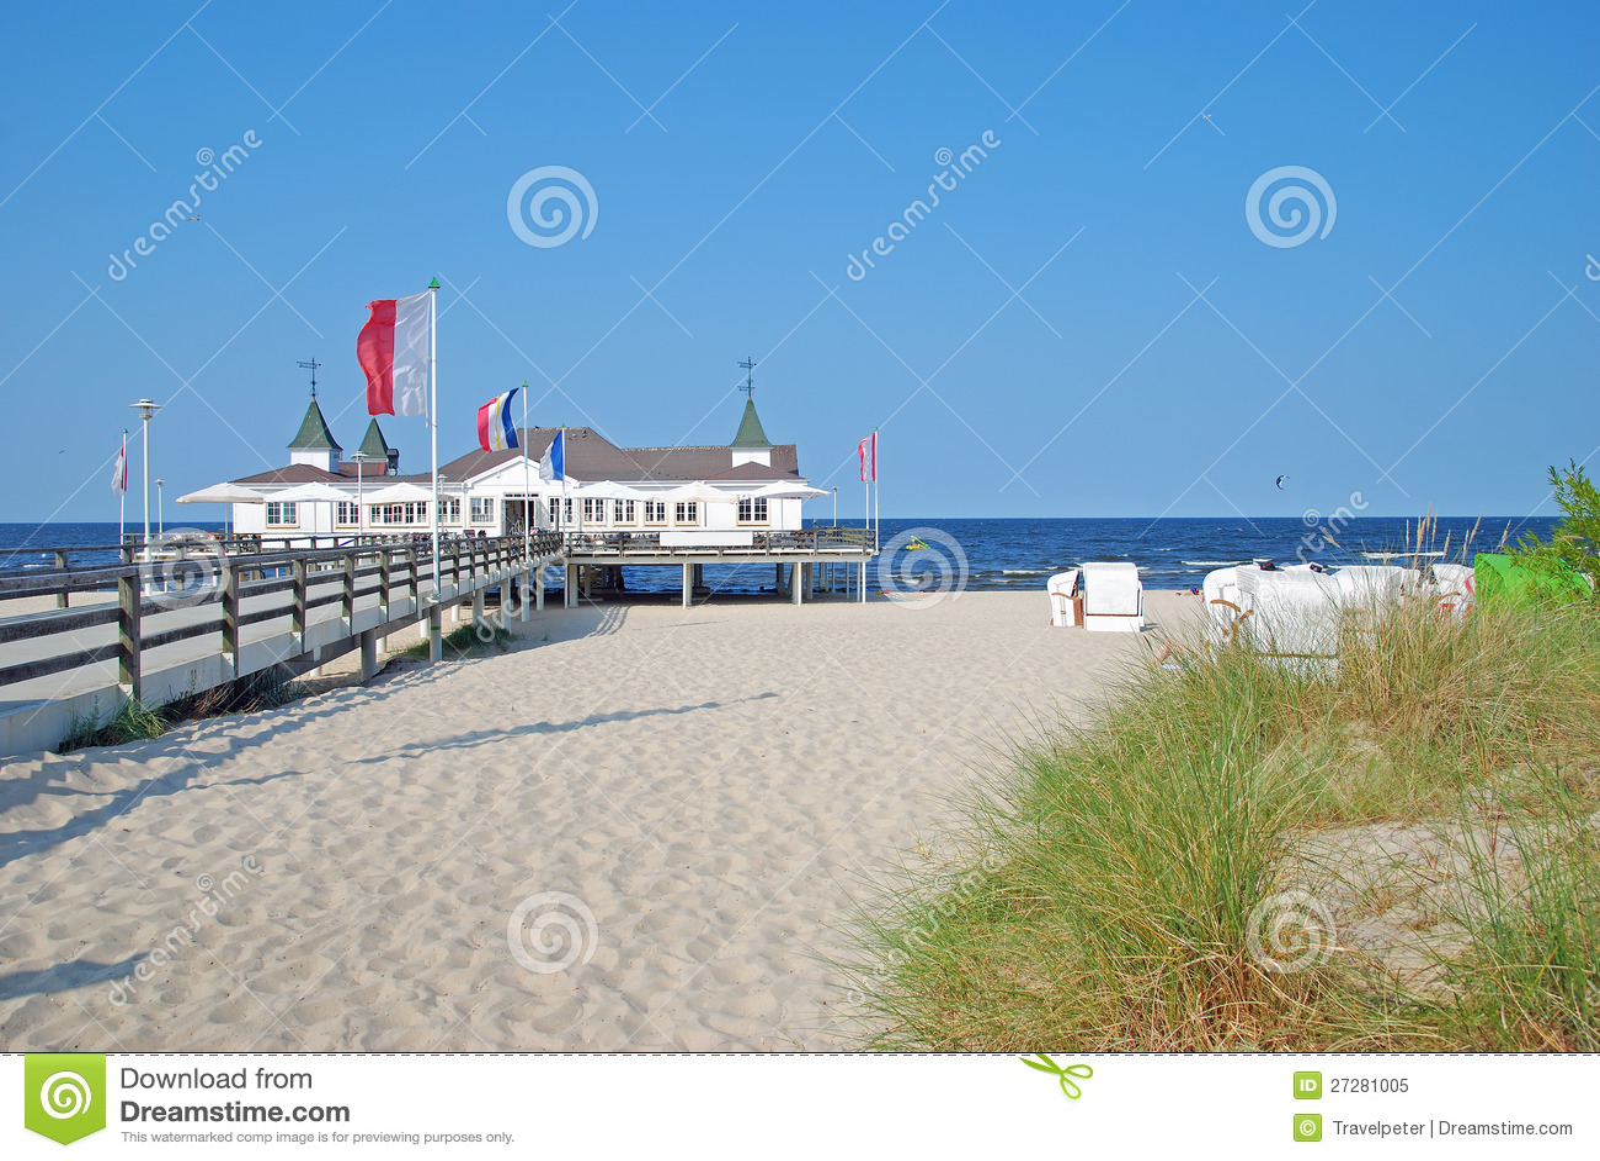 Ahlbeck usedomö, Östersjön, Tyskland